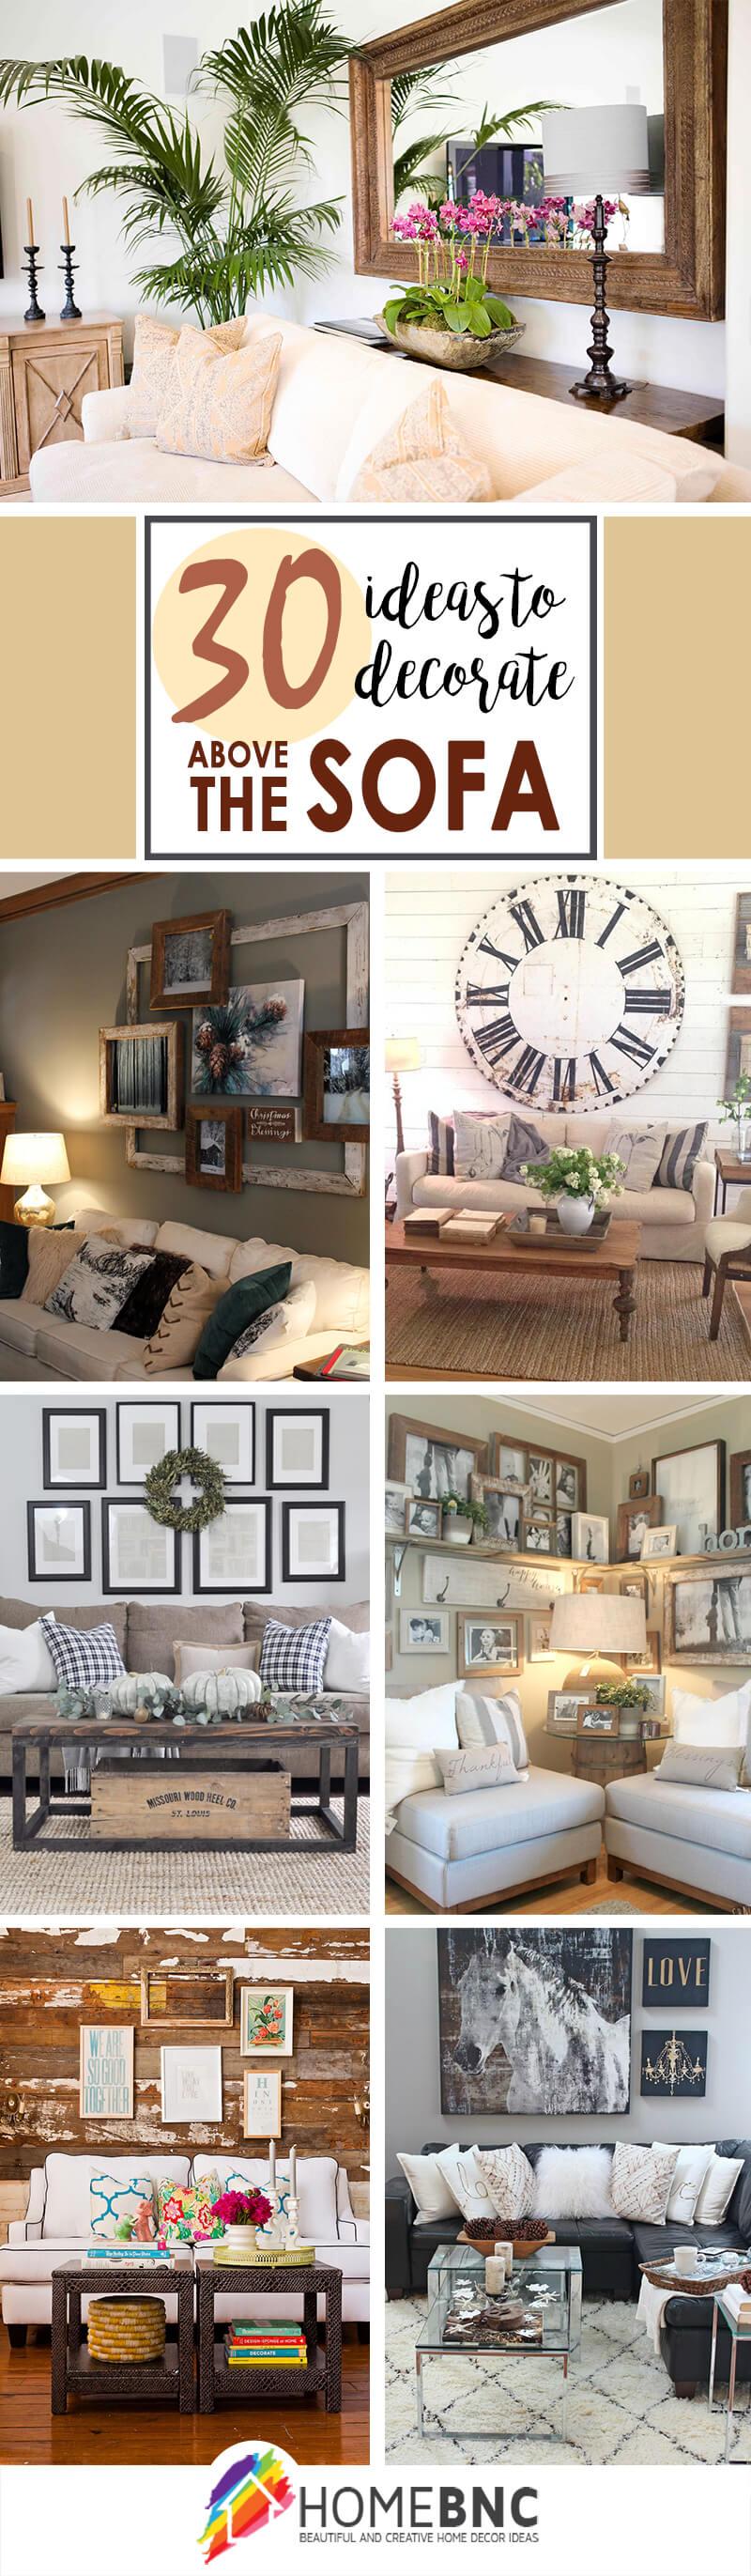 decoration-ideas-above-the-sofa-pinterest-share-homebnc